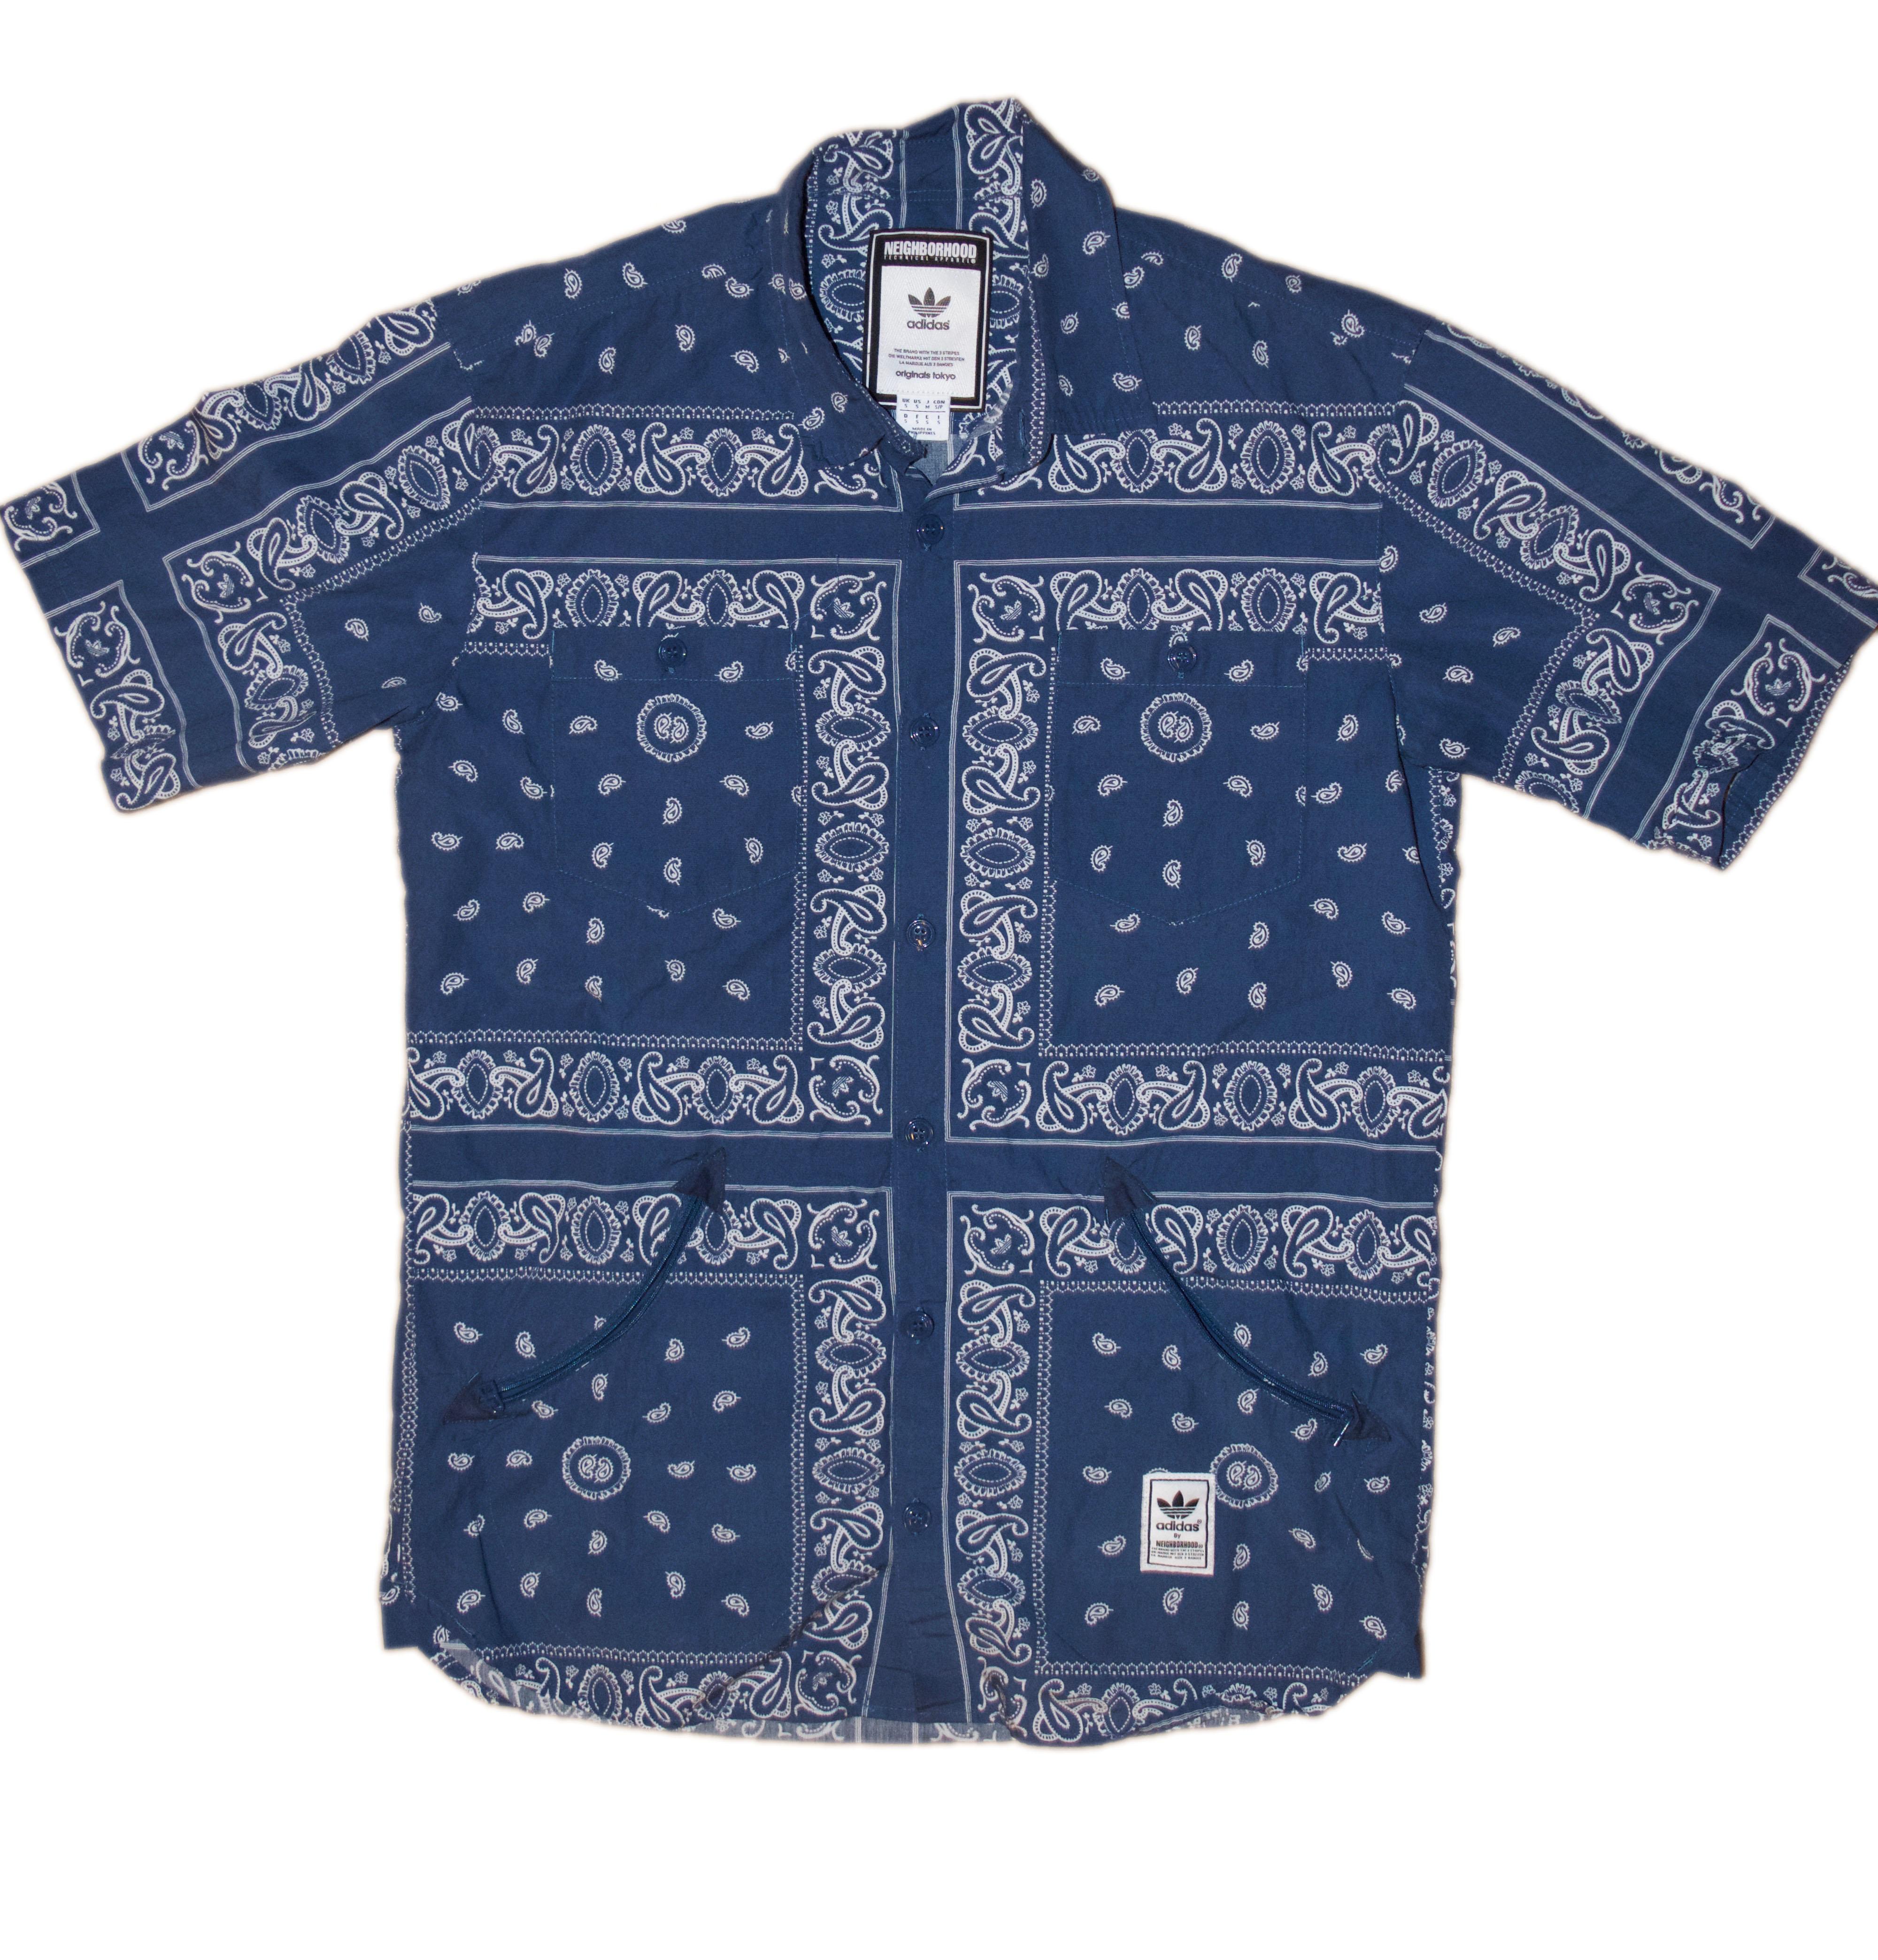 adidas button up shirt